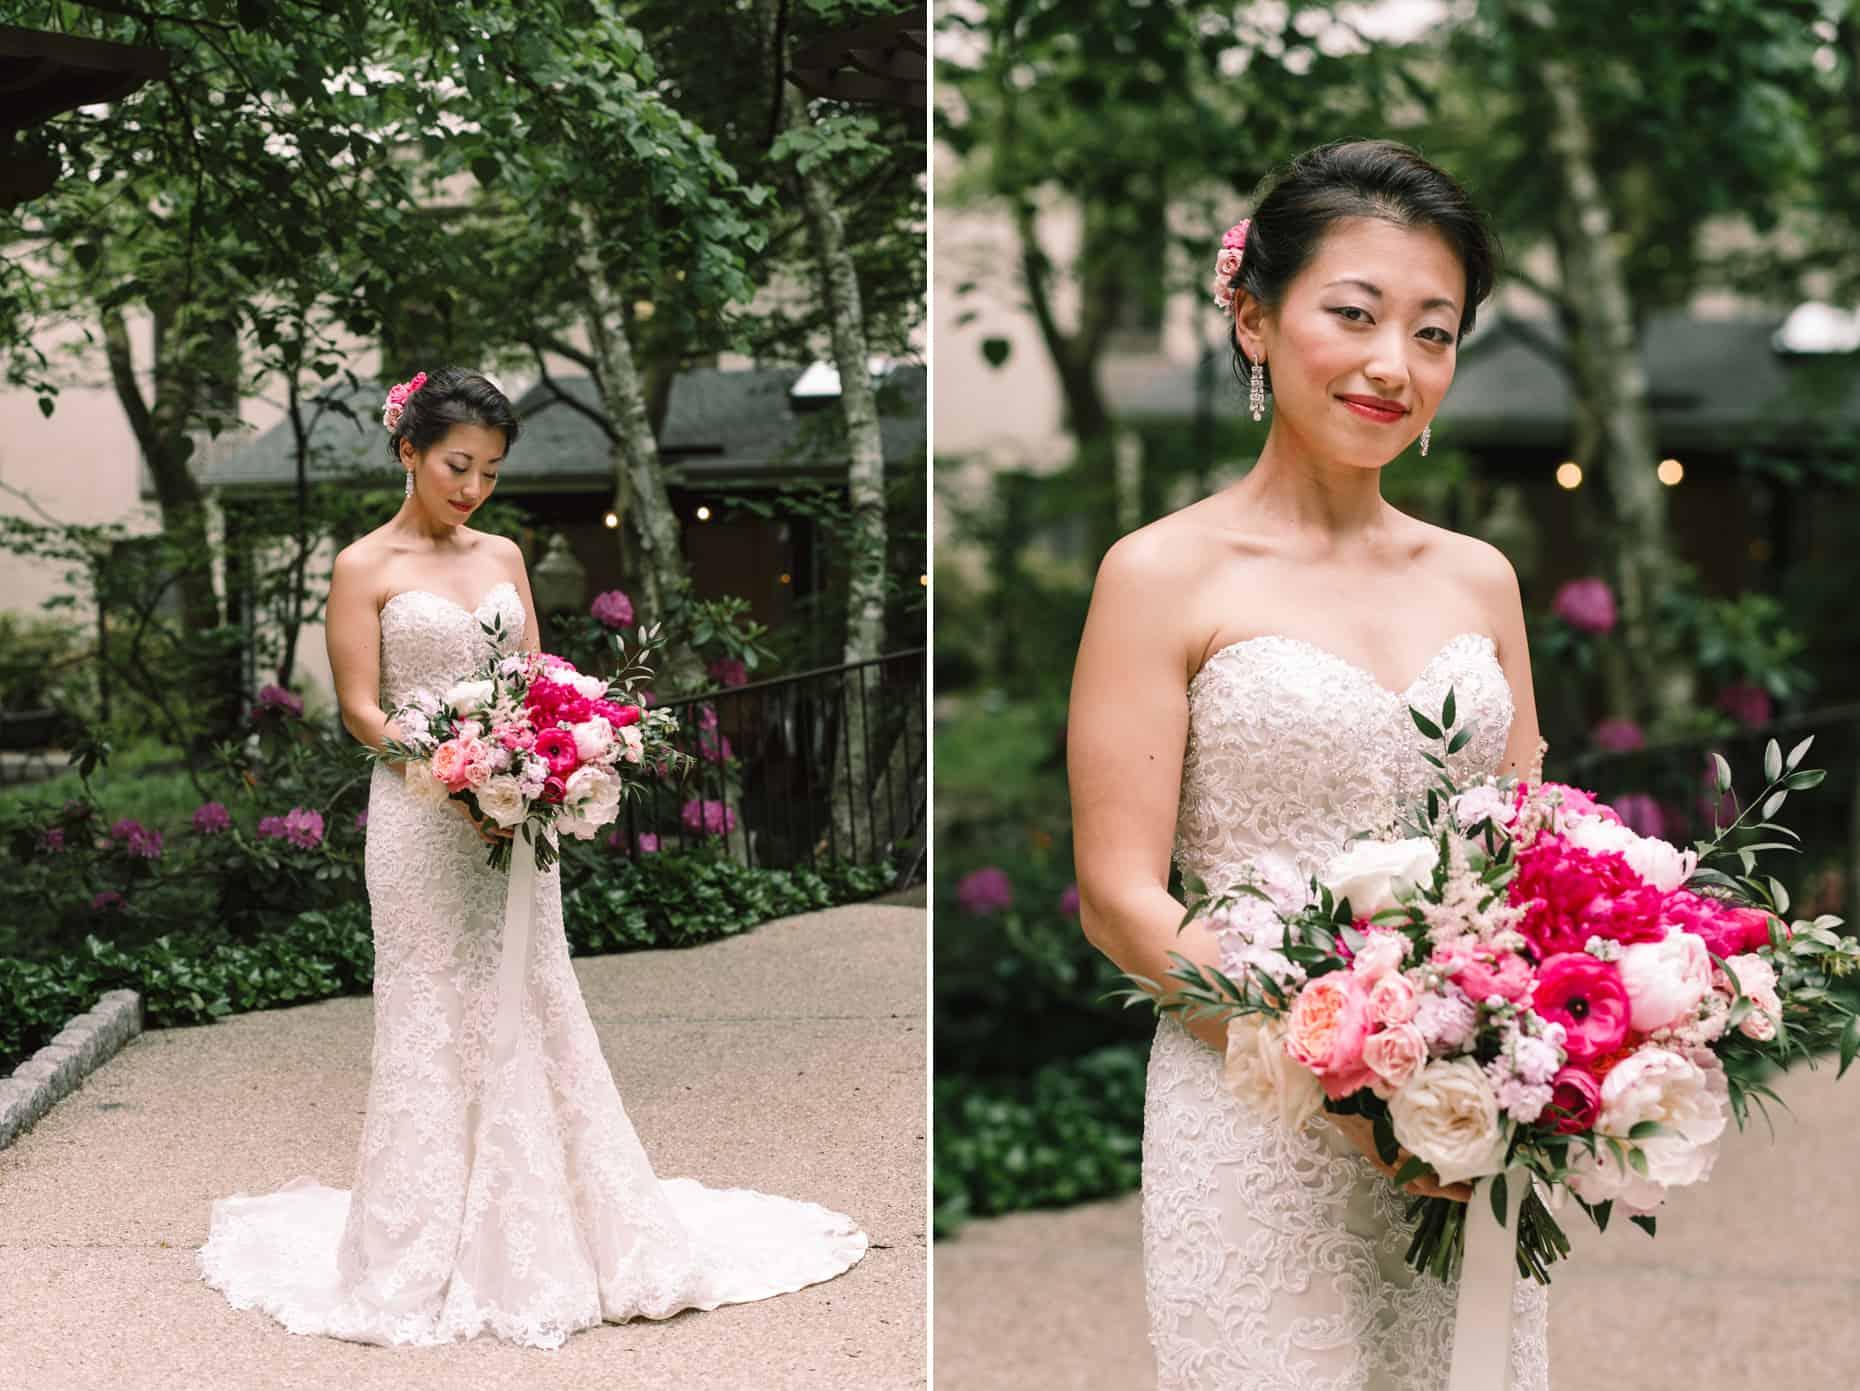 Radnor Wedding Photo